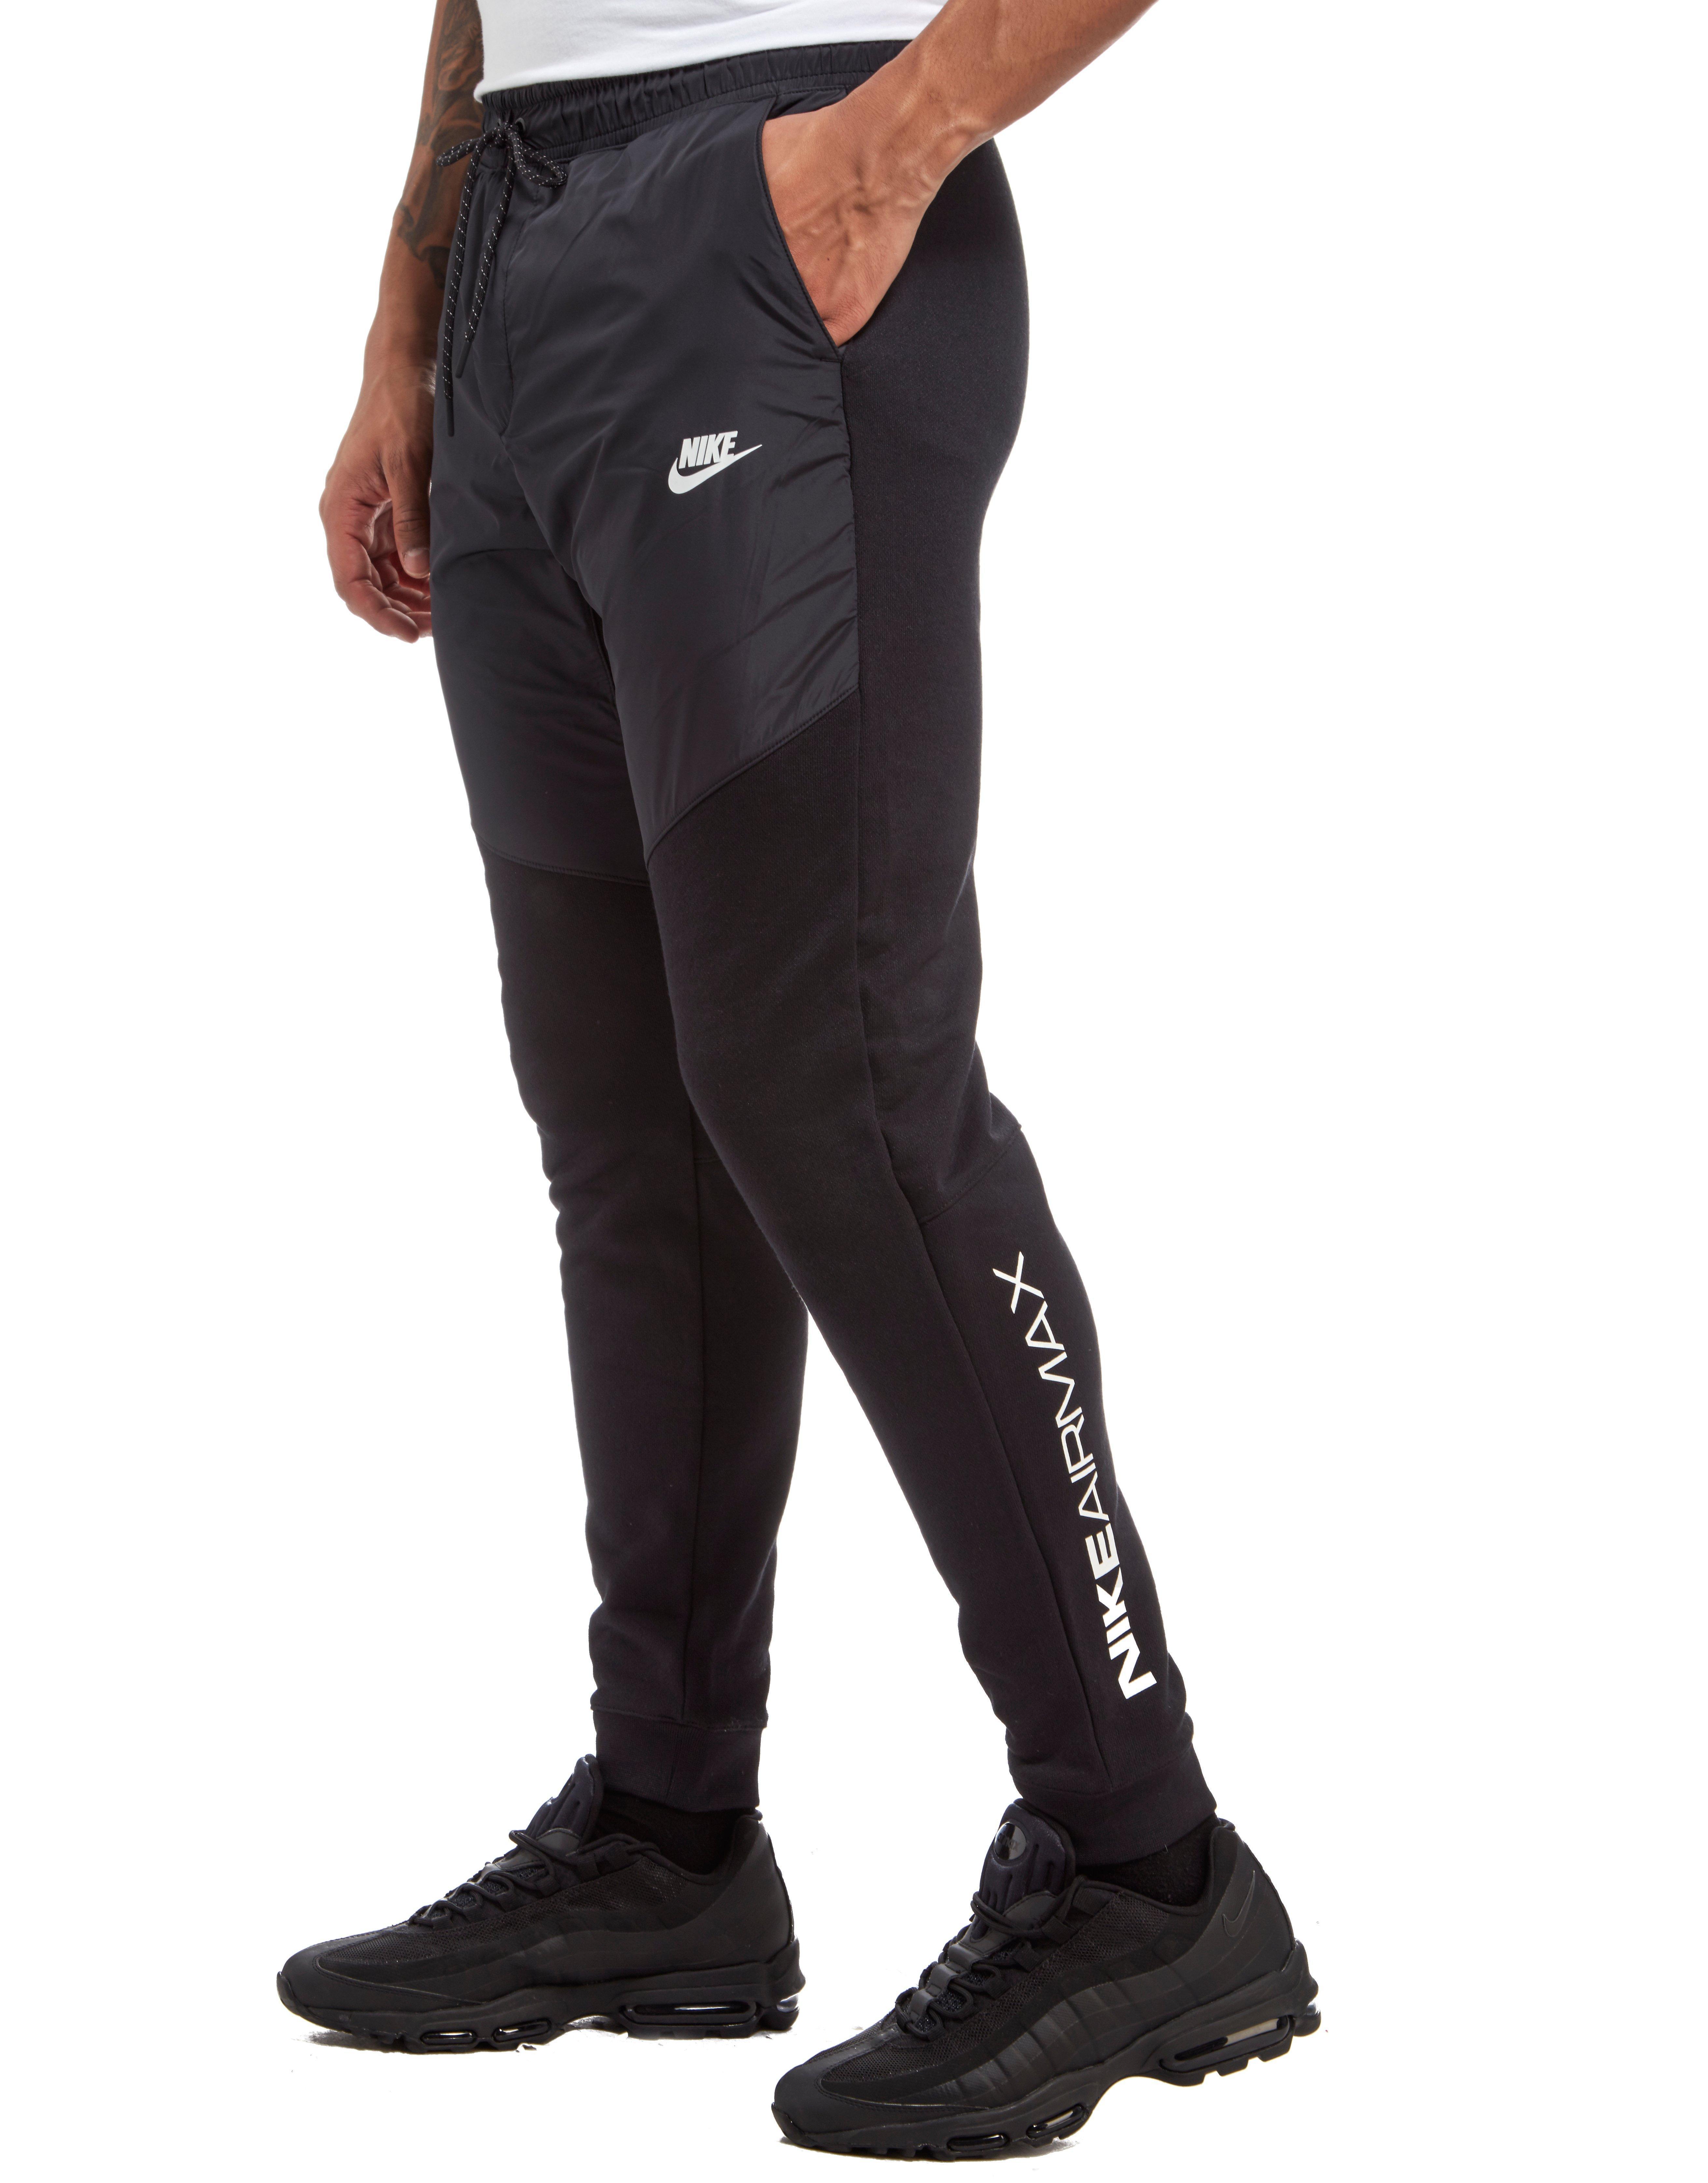 Lyst Nike Air Max Ft Pants In Black For Men